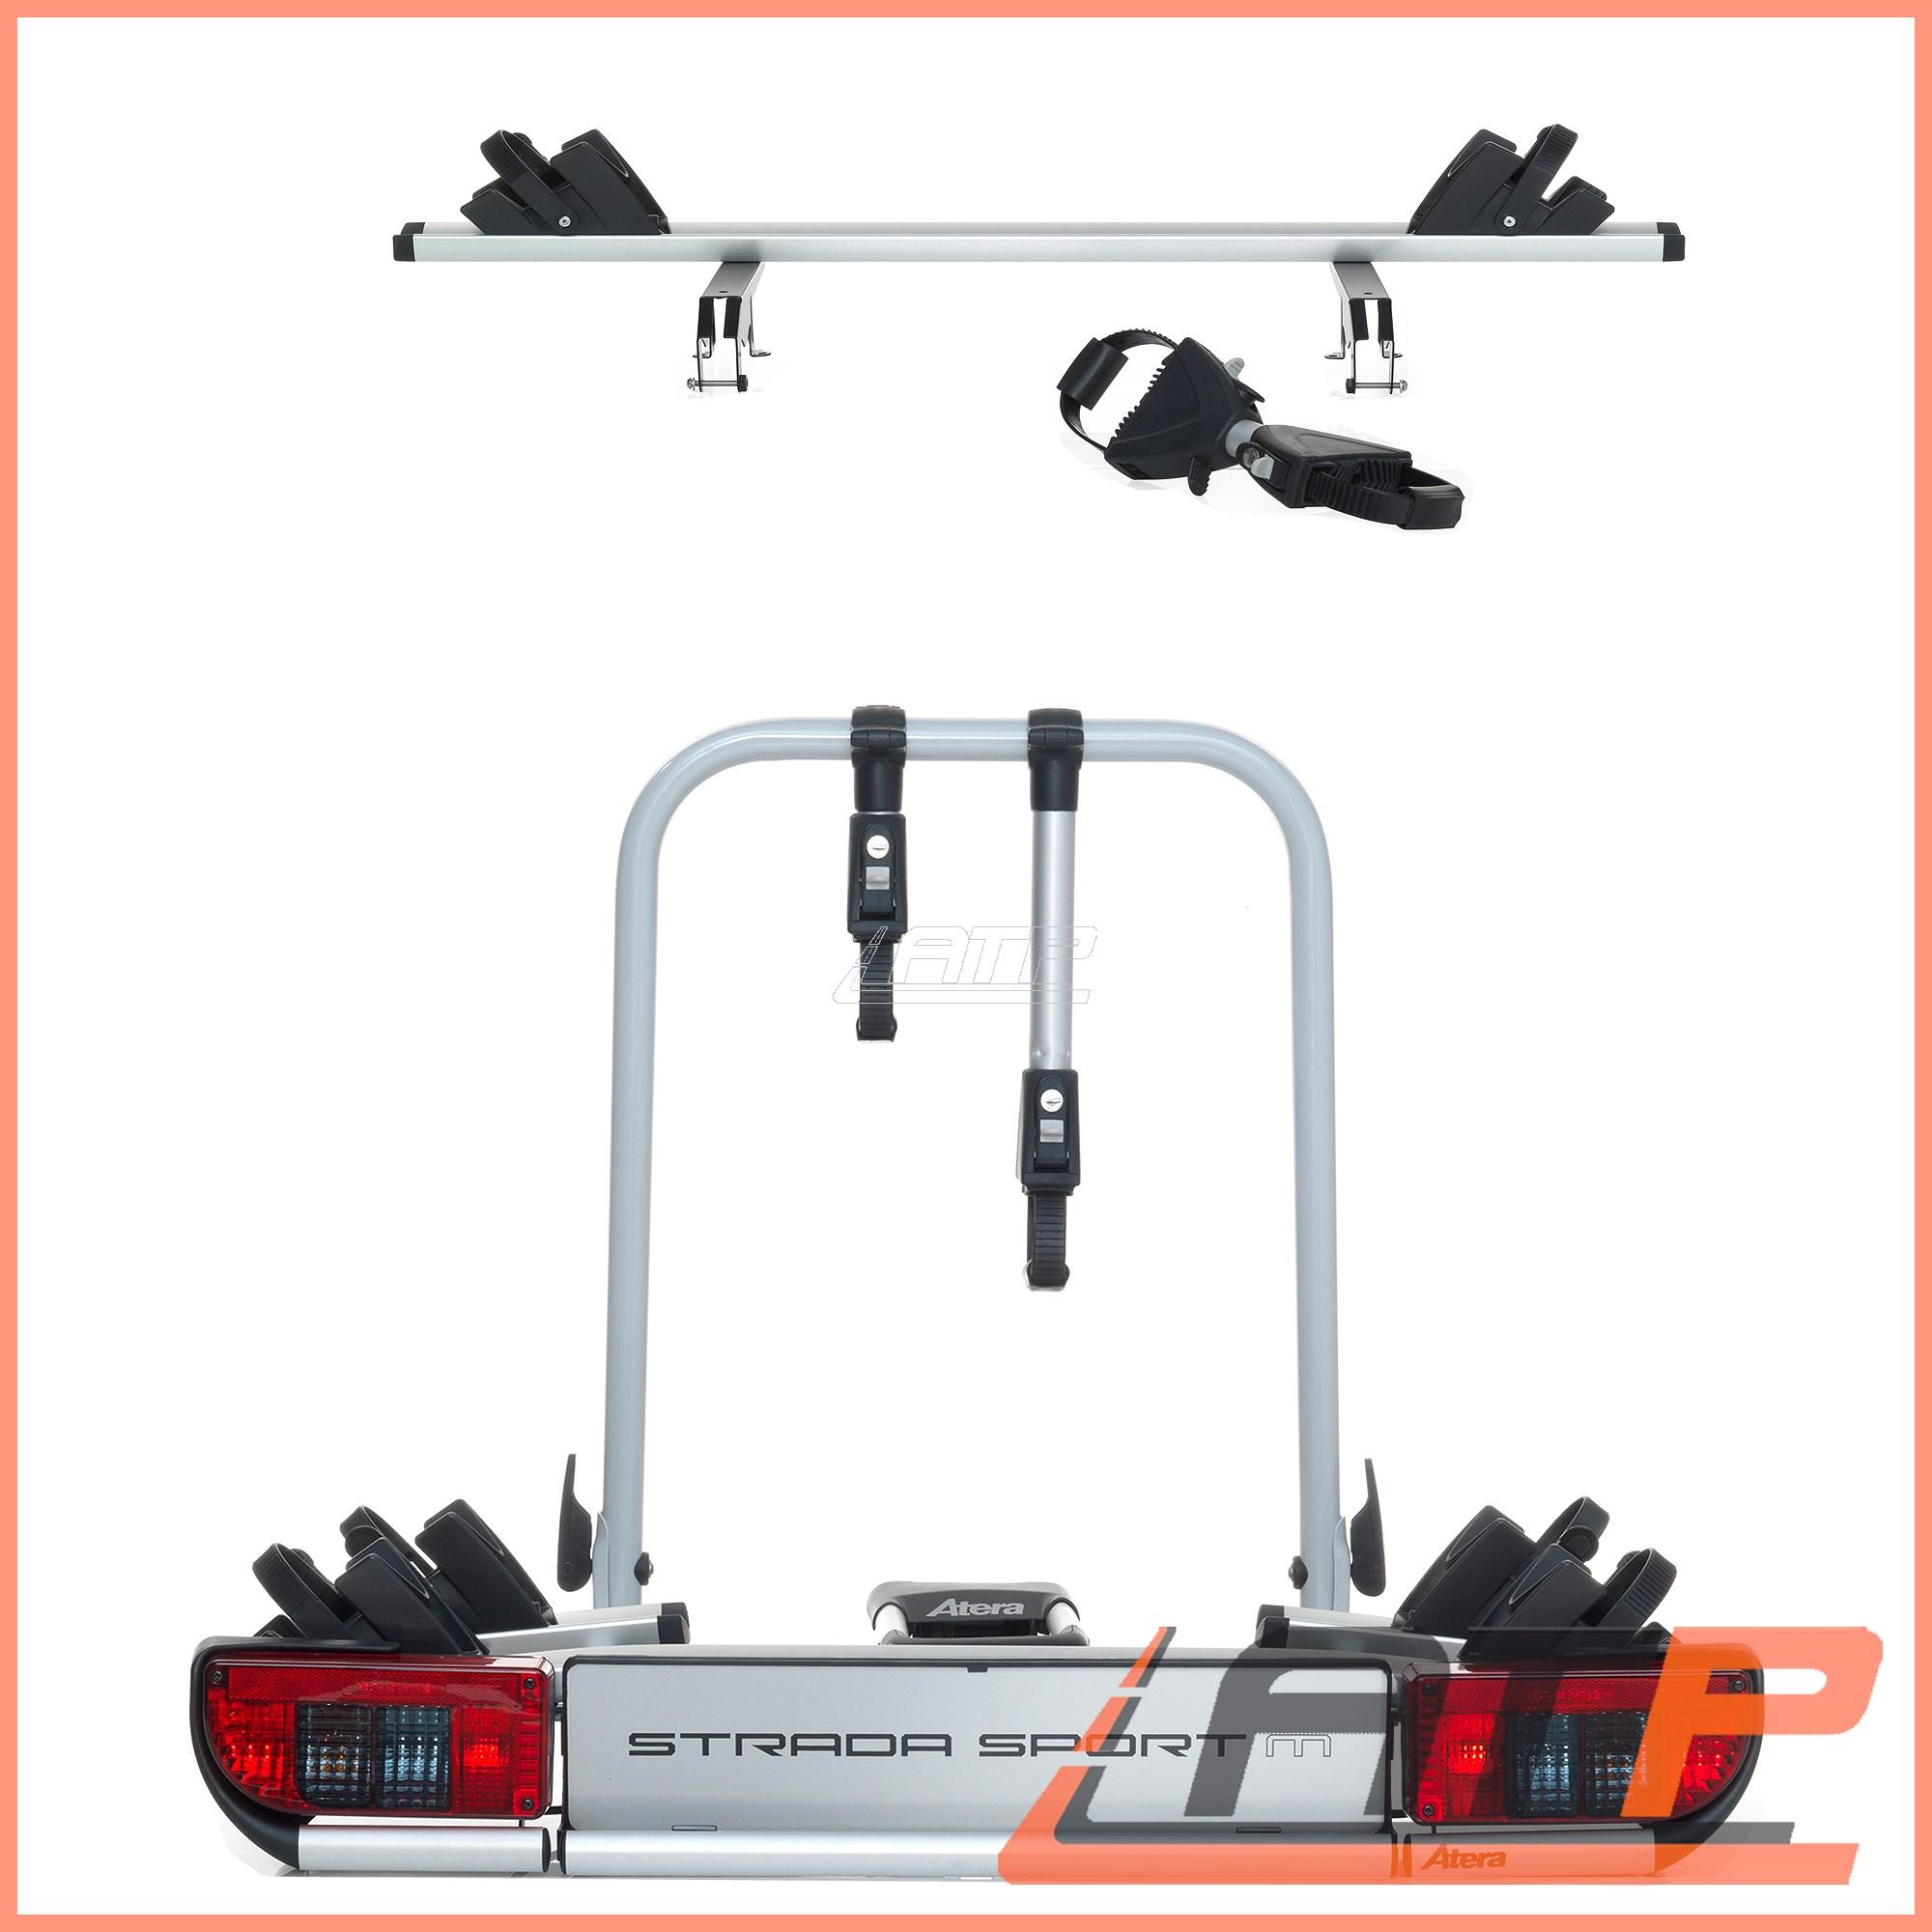 1x atera strada sport m 2 rear towbar bike carrier rack 022684 13 pin connection ebay. Black Bedroom Furniture Sets. Home Design Ideas